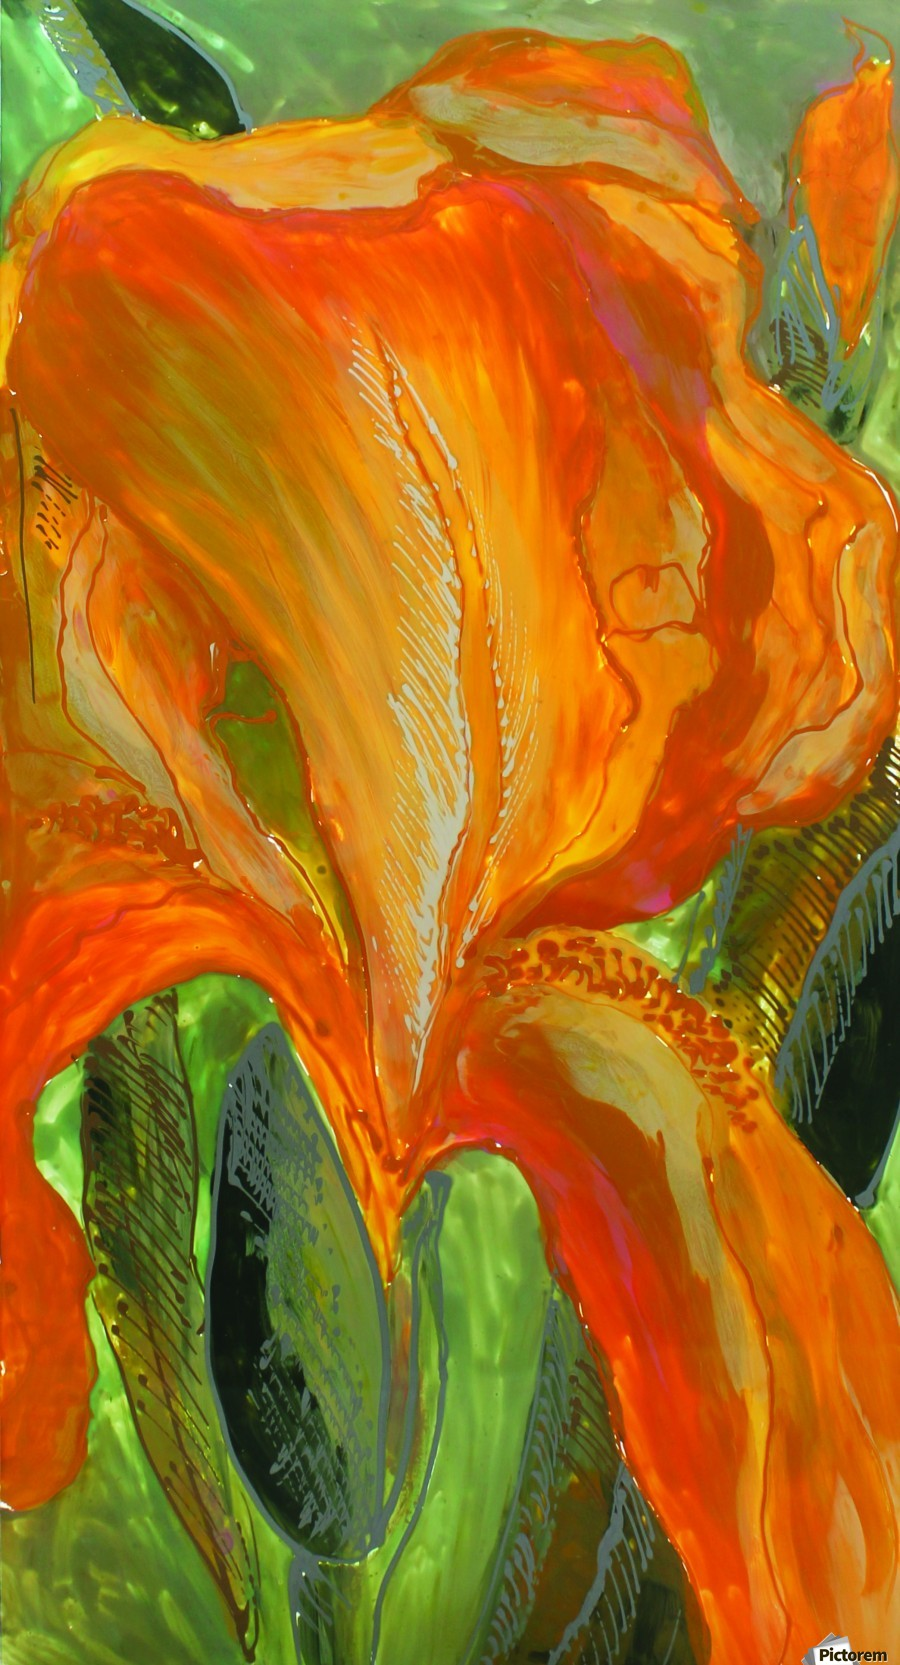 Polyptic with irises 2 by Vali Irina Ciobanu  Print